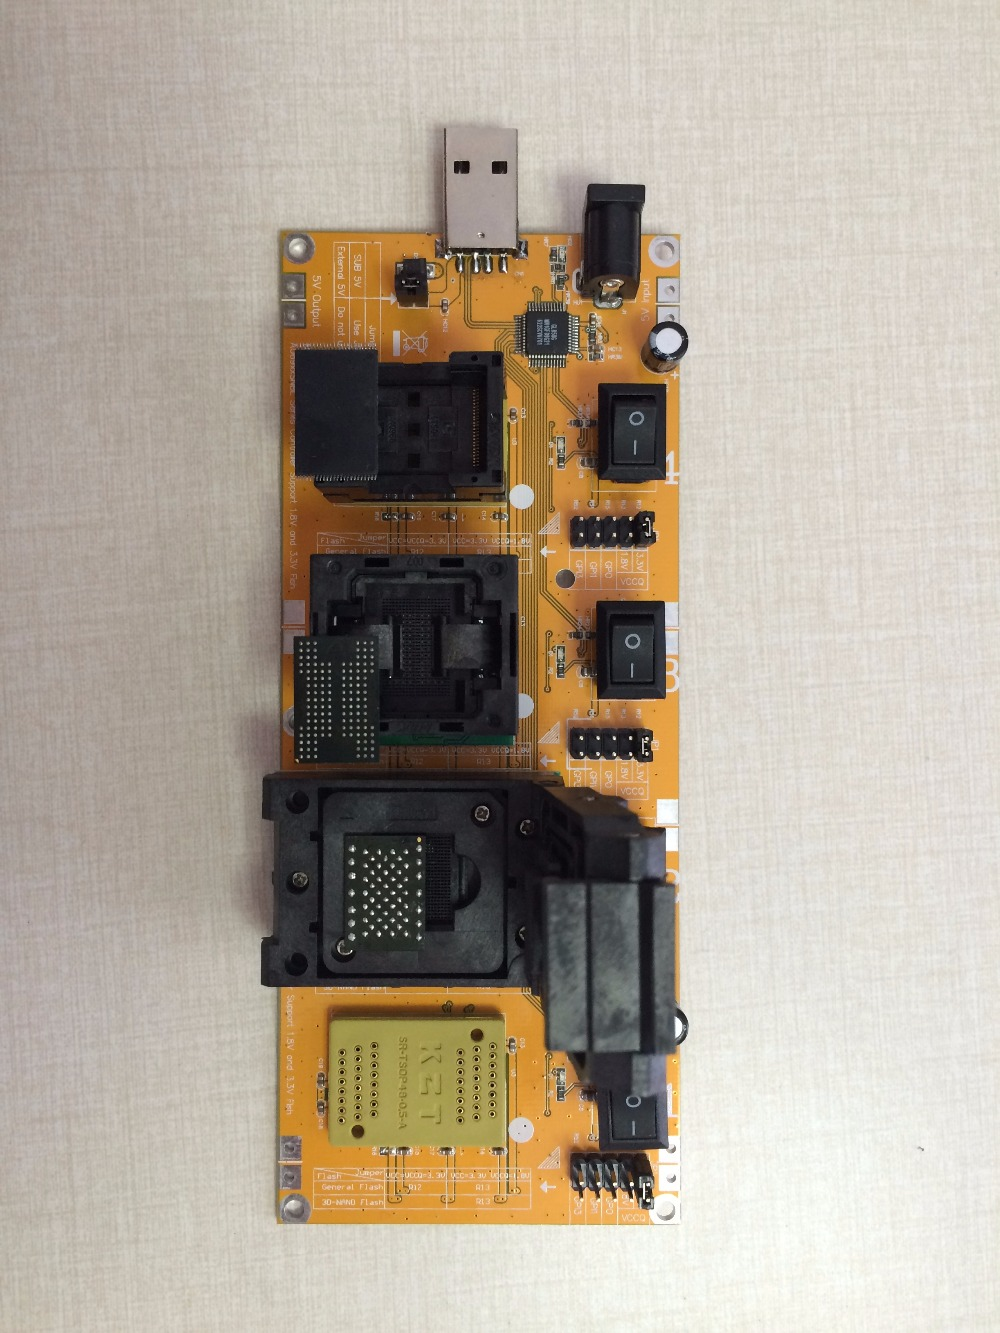 Купить с кэшбэком Flash chip batch tester for U disk flash clearance second-class or recyle chips BGA152 BGA132 BGA100 BGA88 LGA52 TSOP48